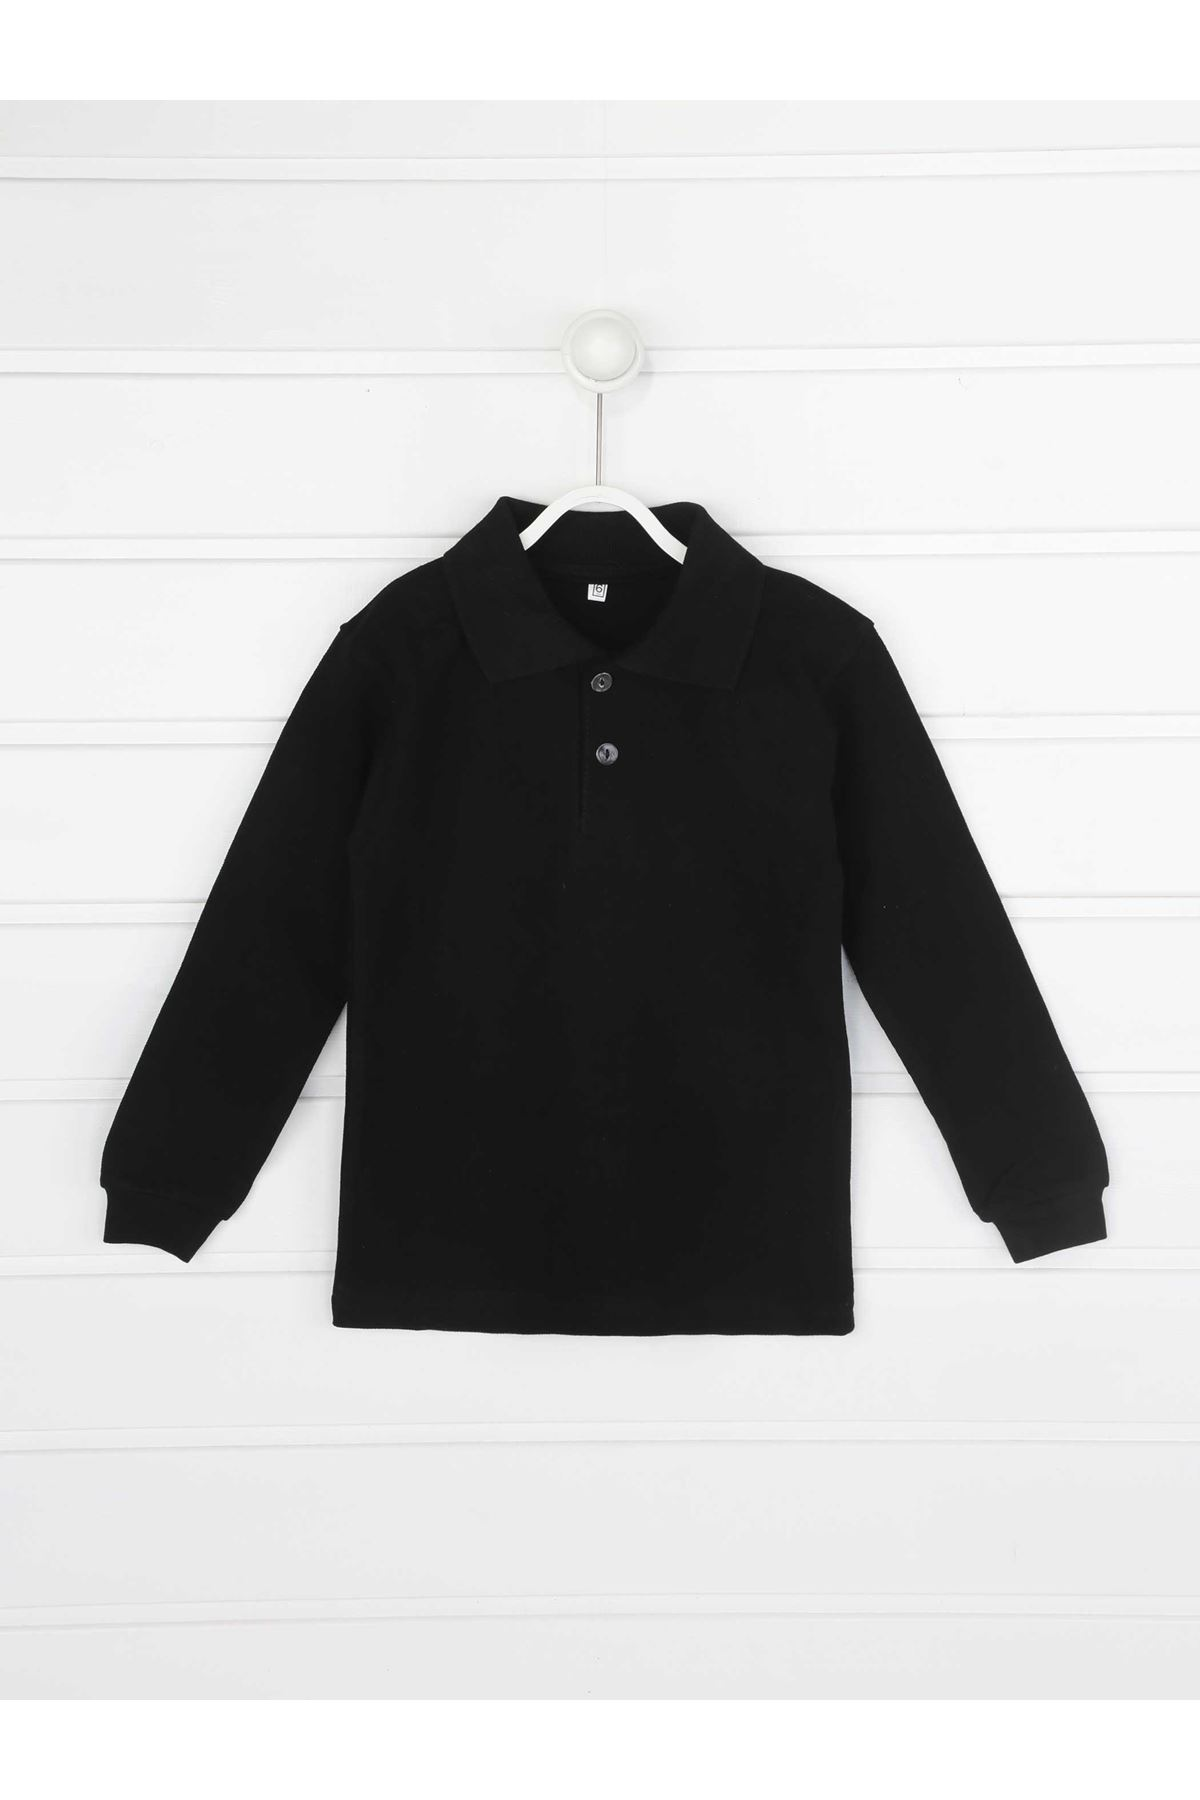 Siyah Polo Yaka Pamuklu Çocuk Basic Tişört